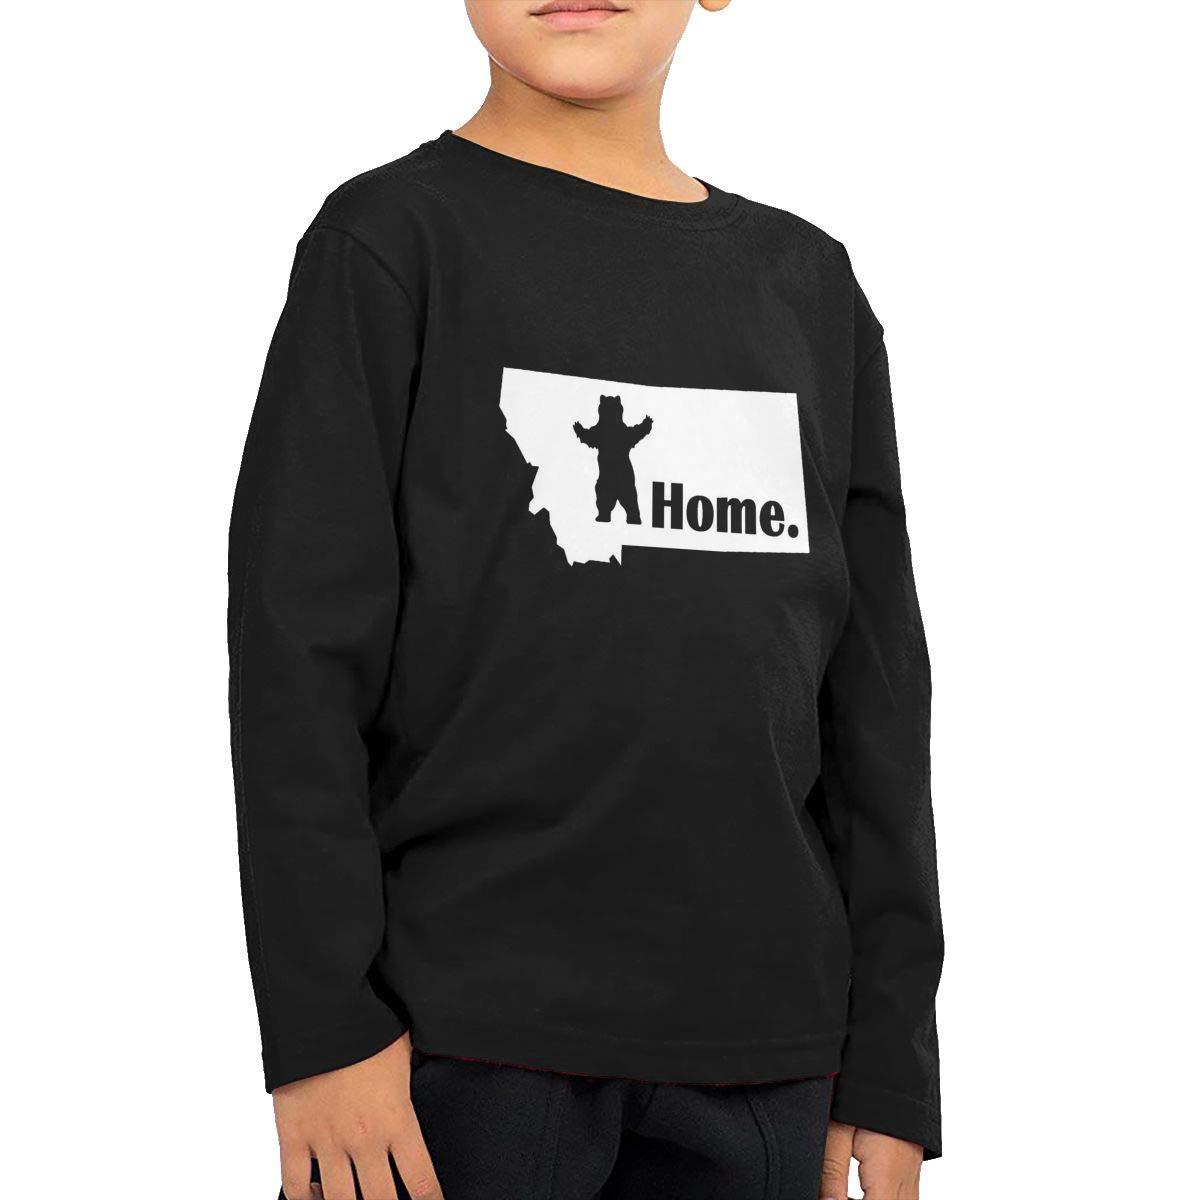 COTDREN Montana Standing Bear Home Boys Cotton Long Sleeve Tshirt